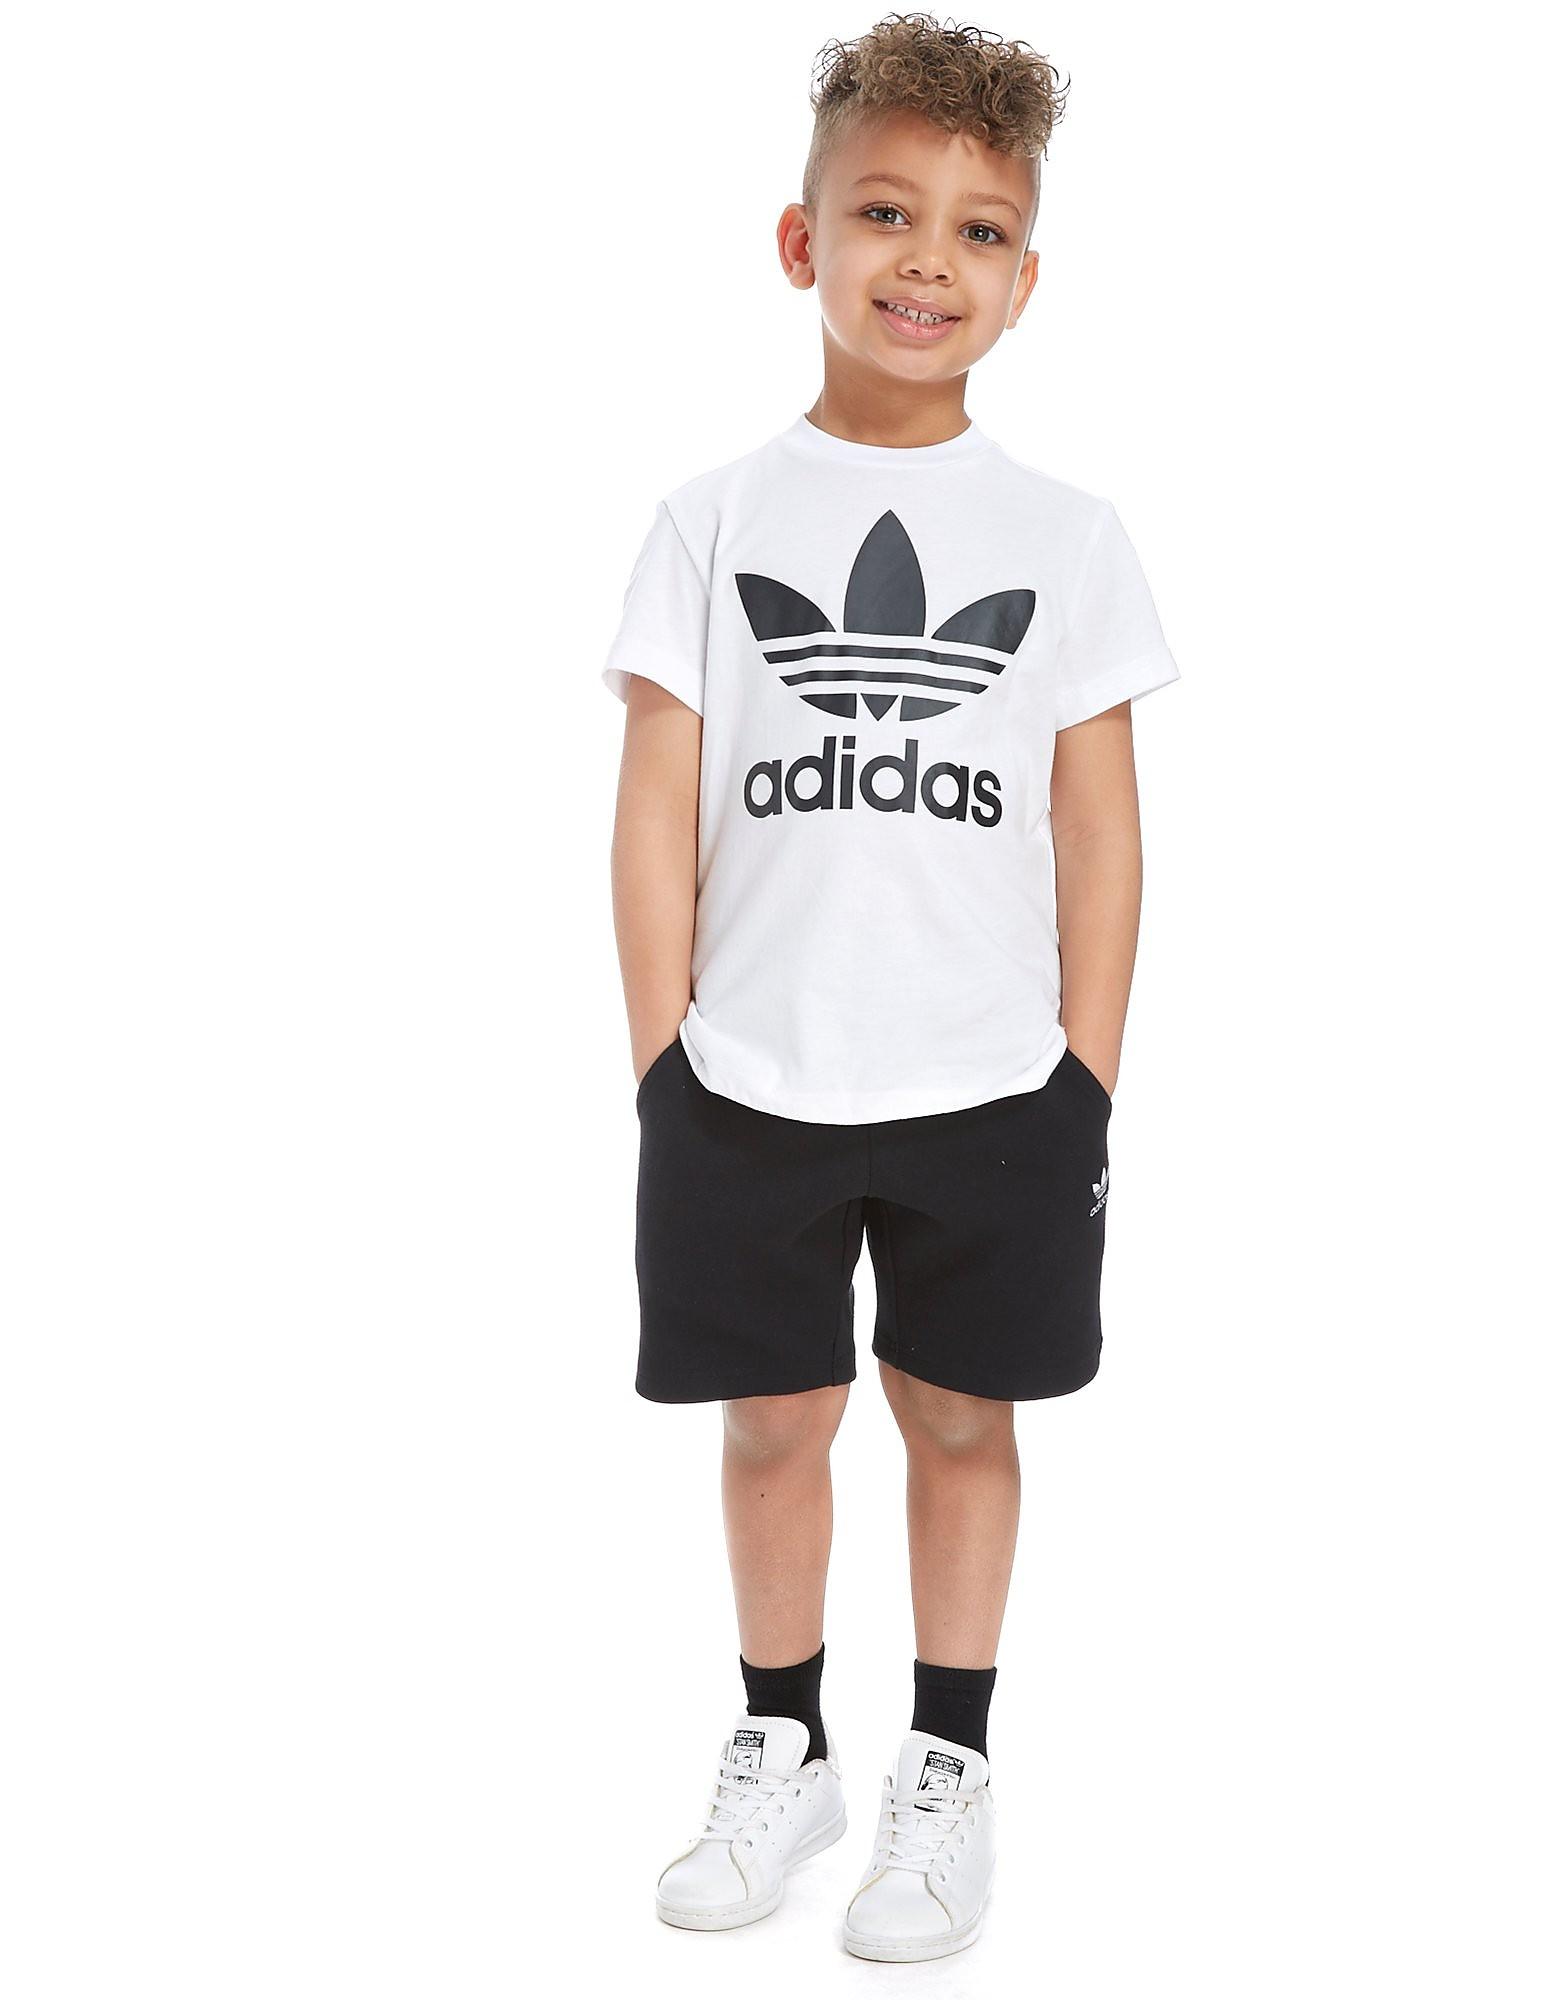 adidas Originals T-Shirt & Short Set Children